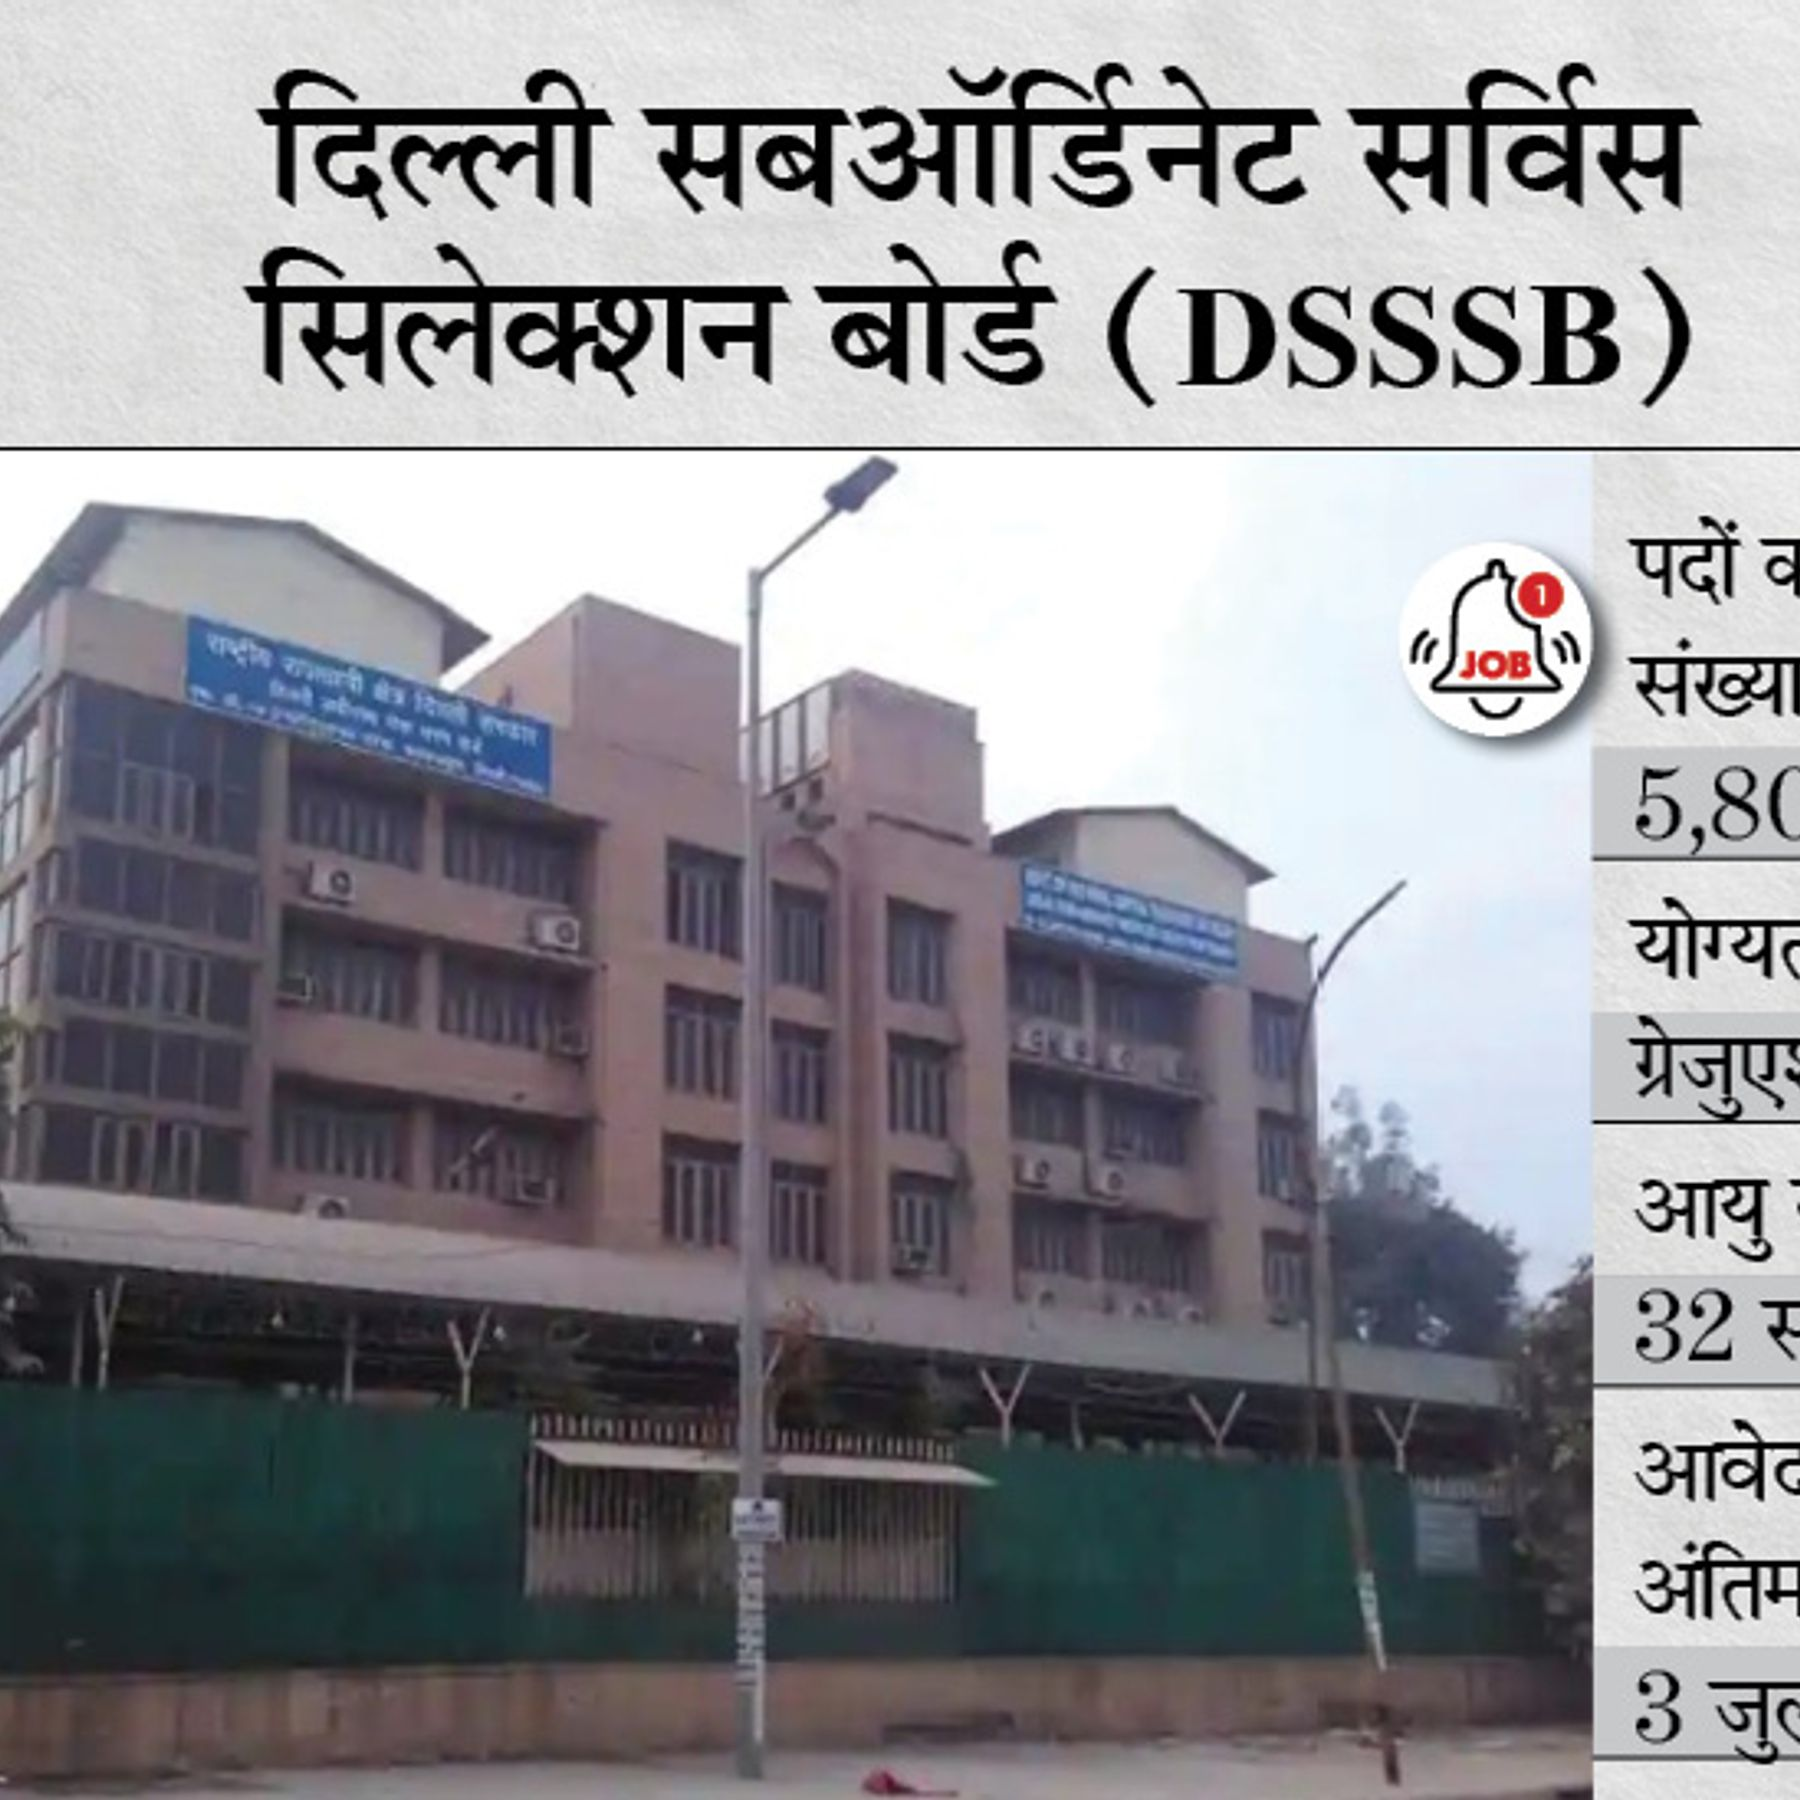 DSSSB Sarkari Naukri DSSSB TGT Posts Recruitment 2021 Delhi Subordinate  Services Selection Board Notification Vacancies Check Vacancy Details And  How To Apply | TGT के 5807 पदों पर भर्ती के लिए करें